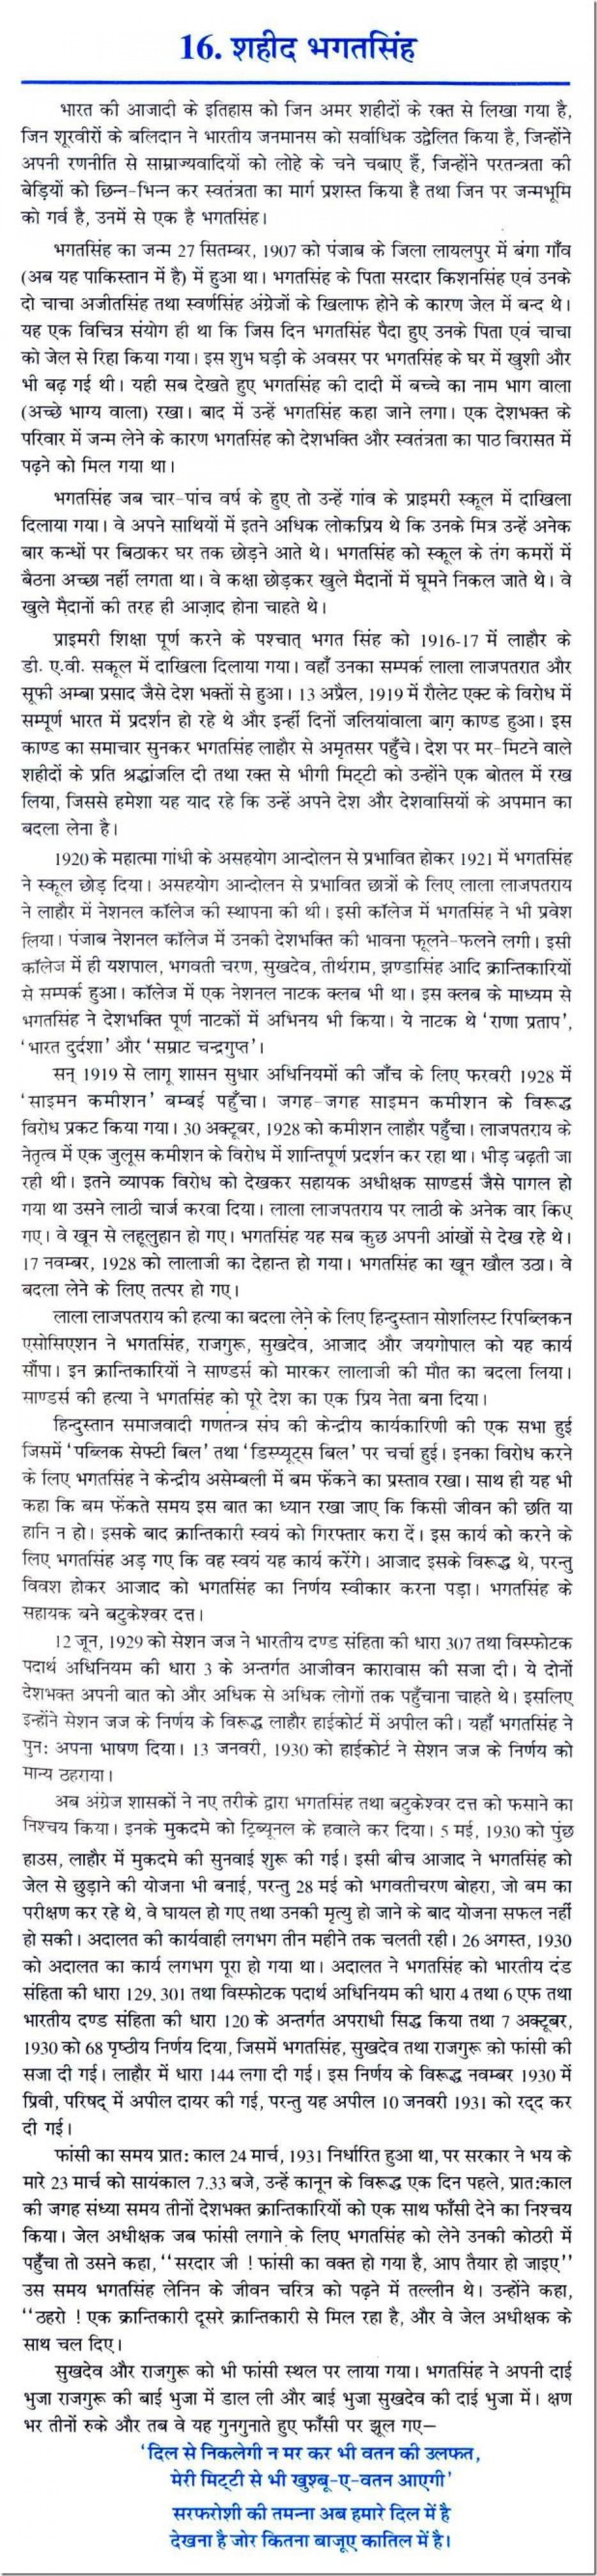 021 Hindi Essay Bhagat Singh Thumb On In Sanskrit English Words Short Punjabi Language Marathi Kannada Telugu Urdu 618x2668 Unique 100 1920